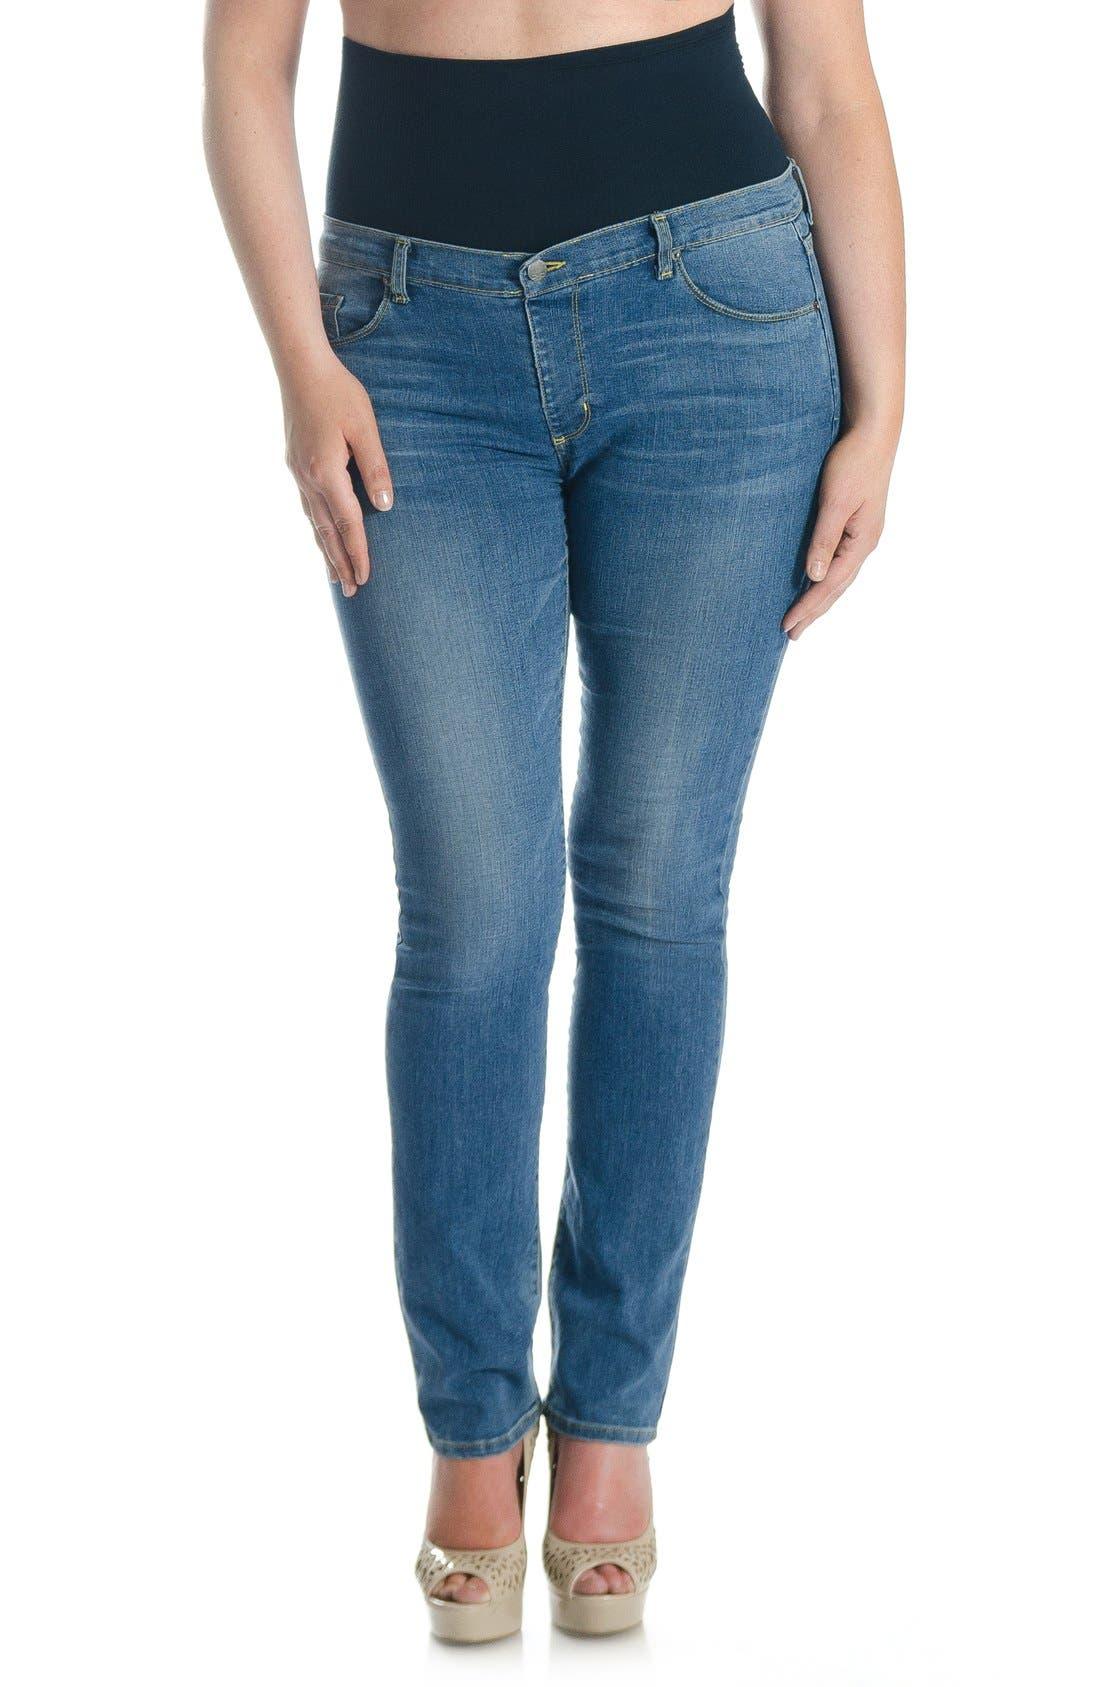 Main Image - Tummy Trimmer Denim Mid Rise Straight LegShapewearJeans